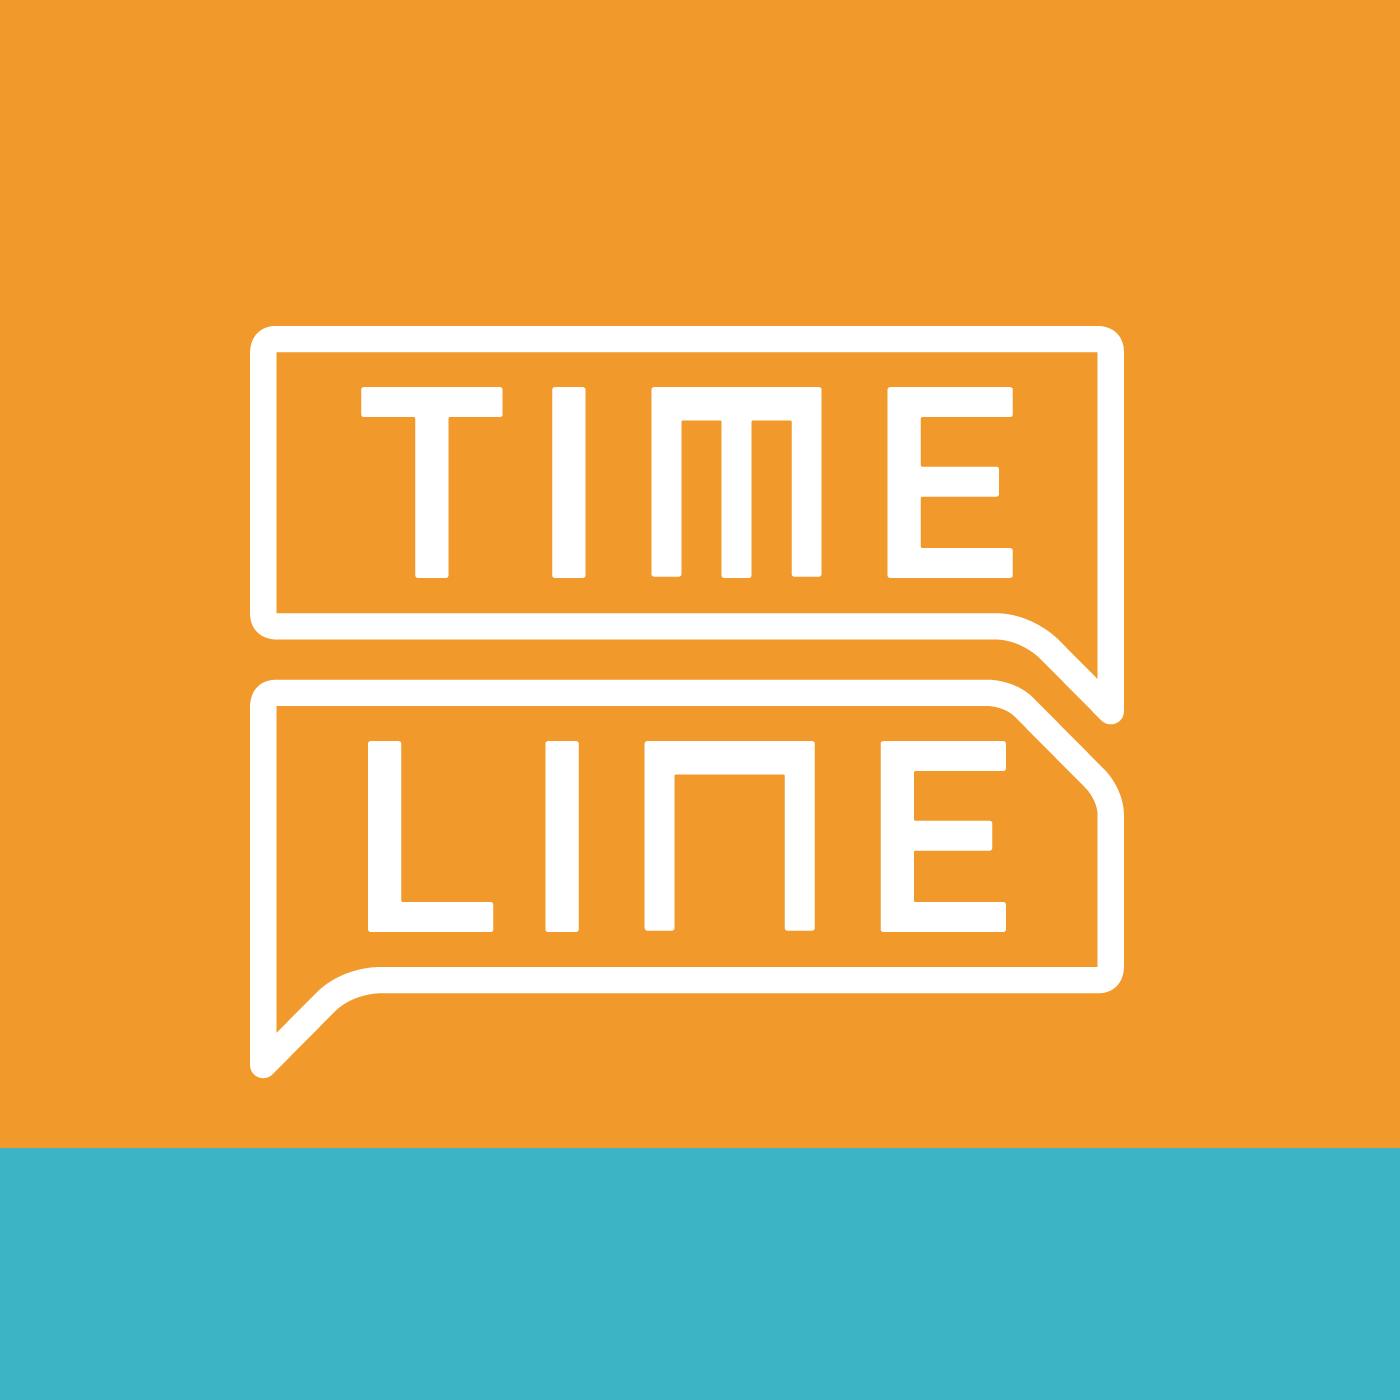 Timeline Gaúcha 14/08/2017